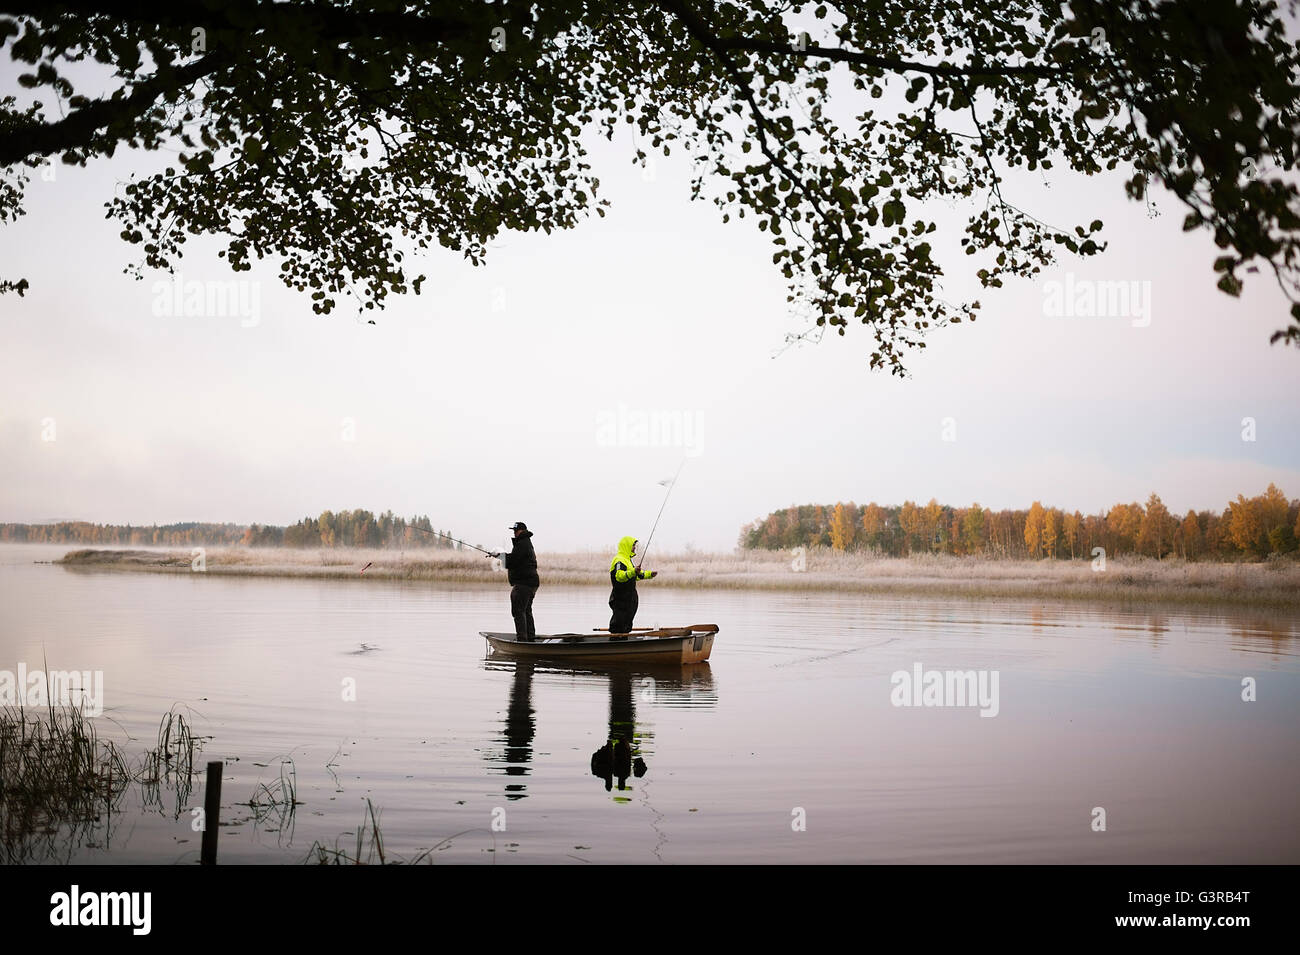 La Svezia, Vastmanland, Bergslagen, Torrvarpen, giovani uomini la pesca nel lago al tramonto Immagini Stock